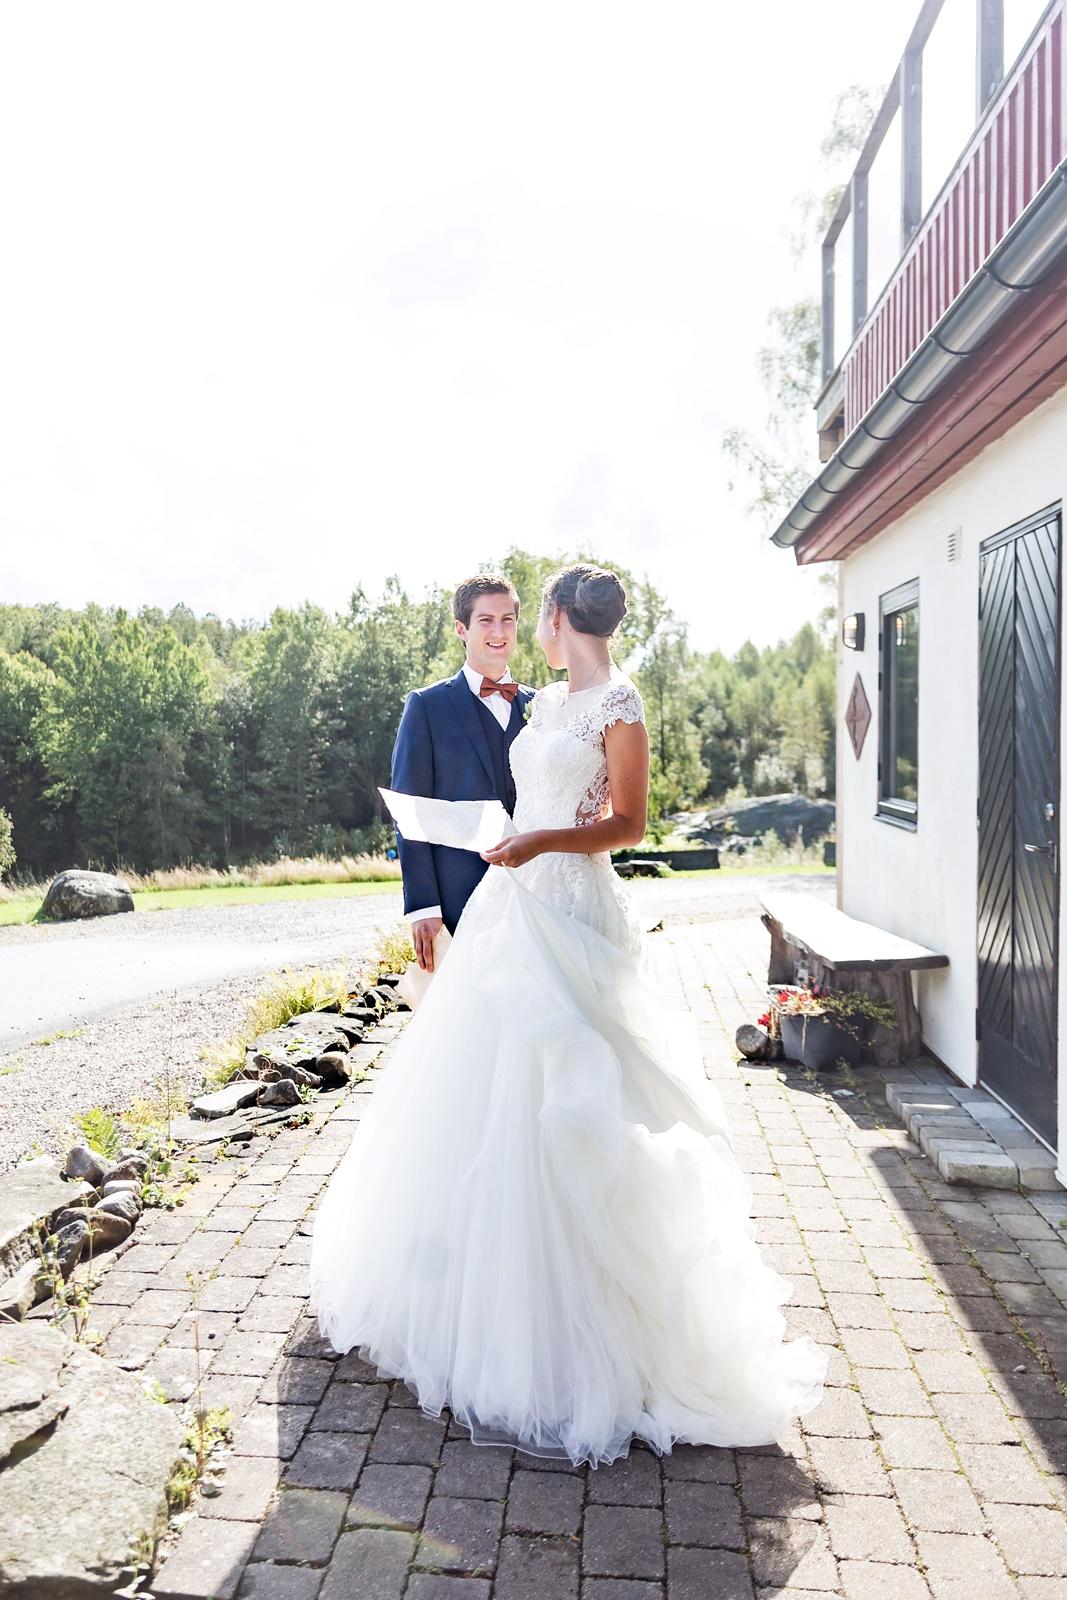 smygtitt bröllopsbilder Madeleine Niklars 2019 Sju Sjöar fotograf Mii Belle Photo Malin Richardsson miibellephoto (10).jpg